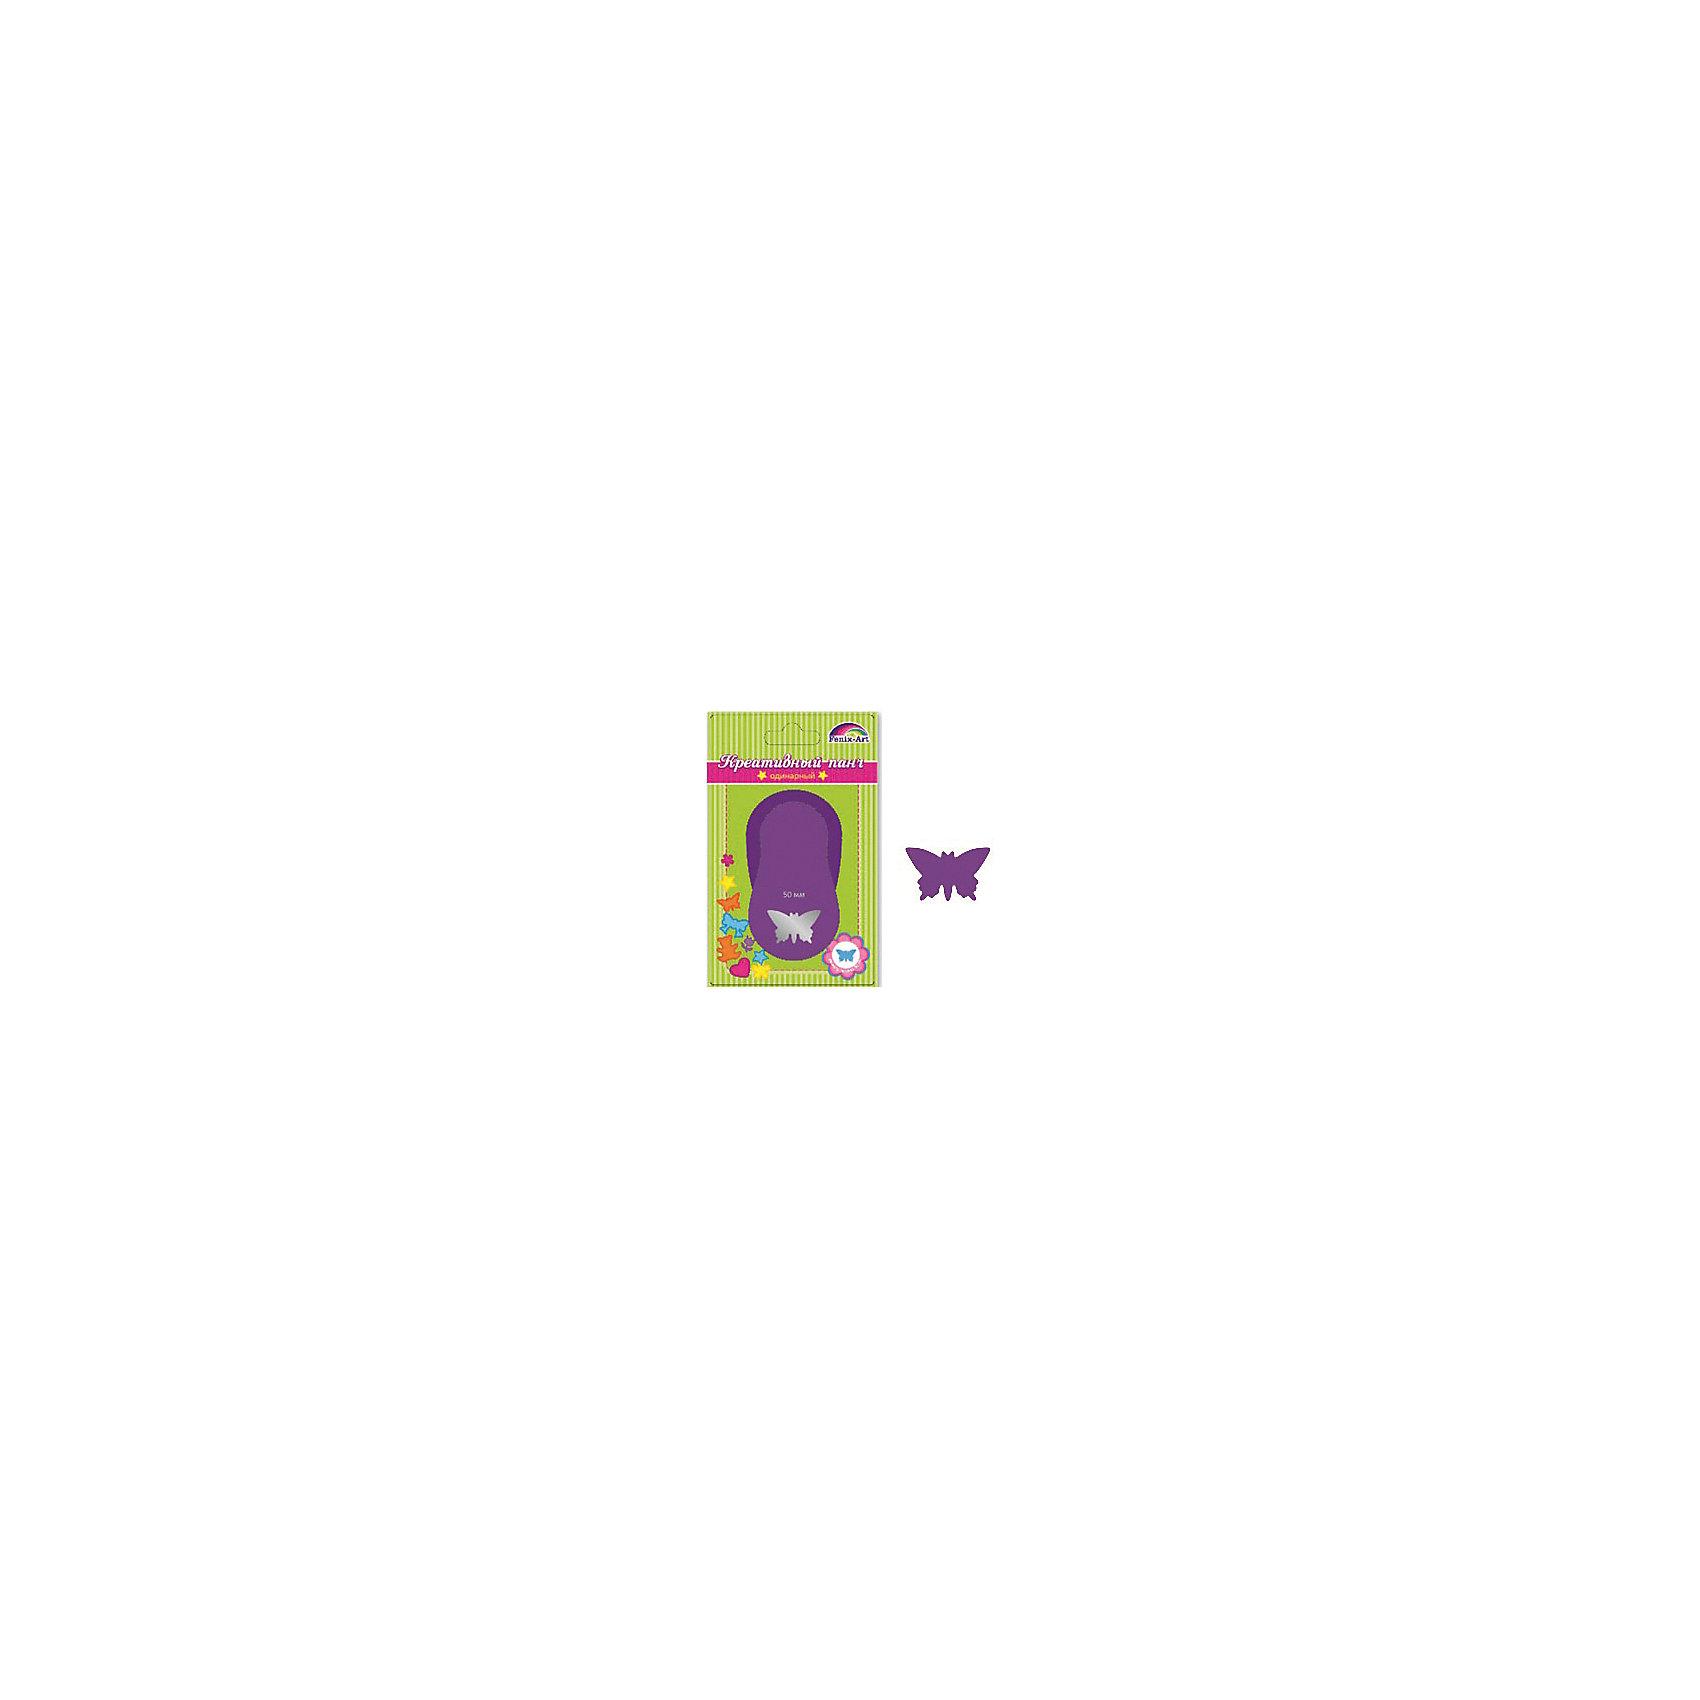 Панч-дырокол одинарный 50 мм Бабочка Феникс+Бумага<br>Панч-дырокол одинарный БАБОЧКА/50 (размер рисунка 50мм, размер панча 112х67х79, сиреневый цвет, в блистере)<br><br>Ширина мм: 180<br>Глубина мм: 110<br>Высота мм: 90<br>Вес г: 325<br>Возраст от месяцев: 72<br>Возраст до месяцев: 2147483647<br>Пол: Унисекс<br>Возраст: Детский<br>SKU: 7046286